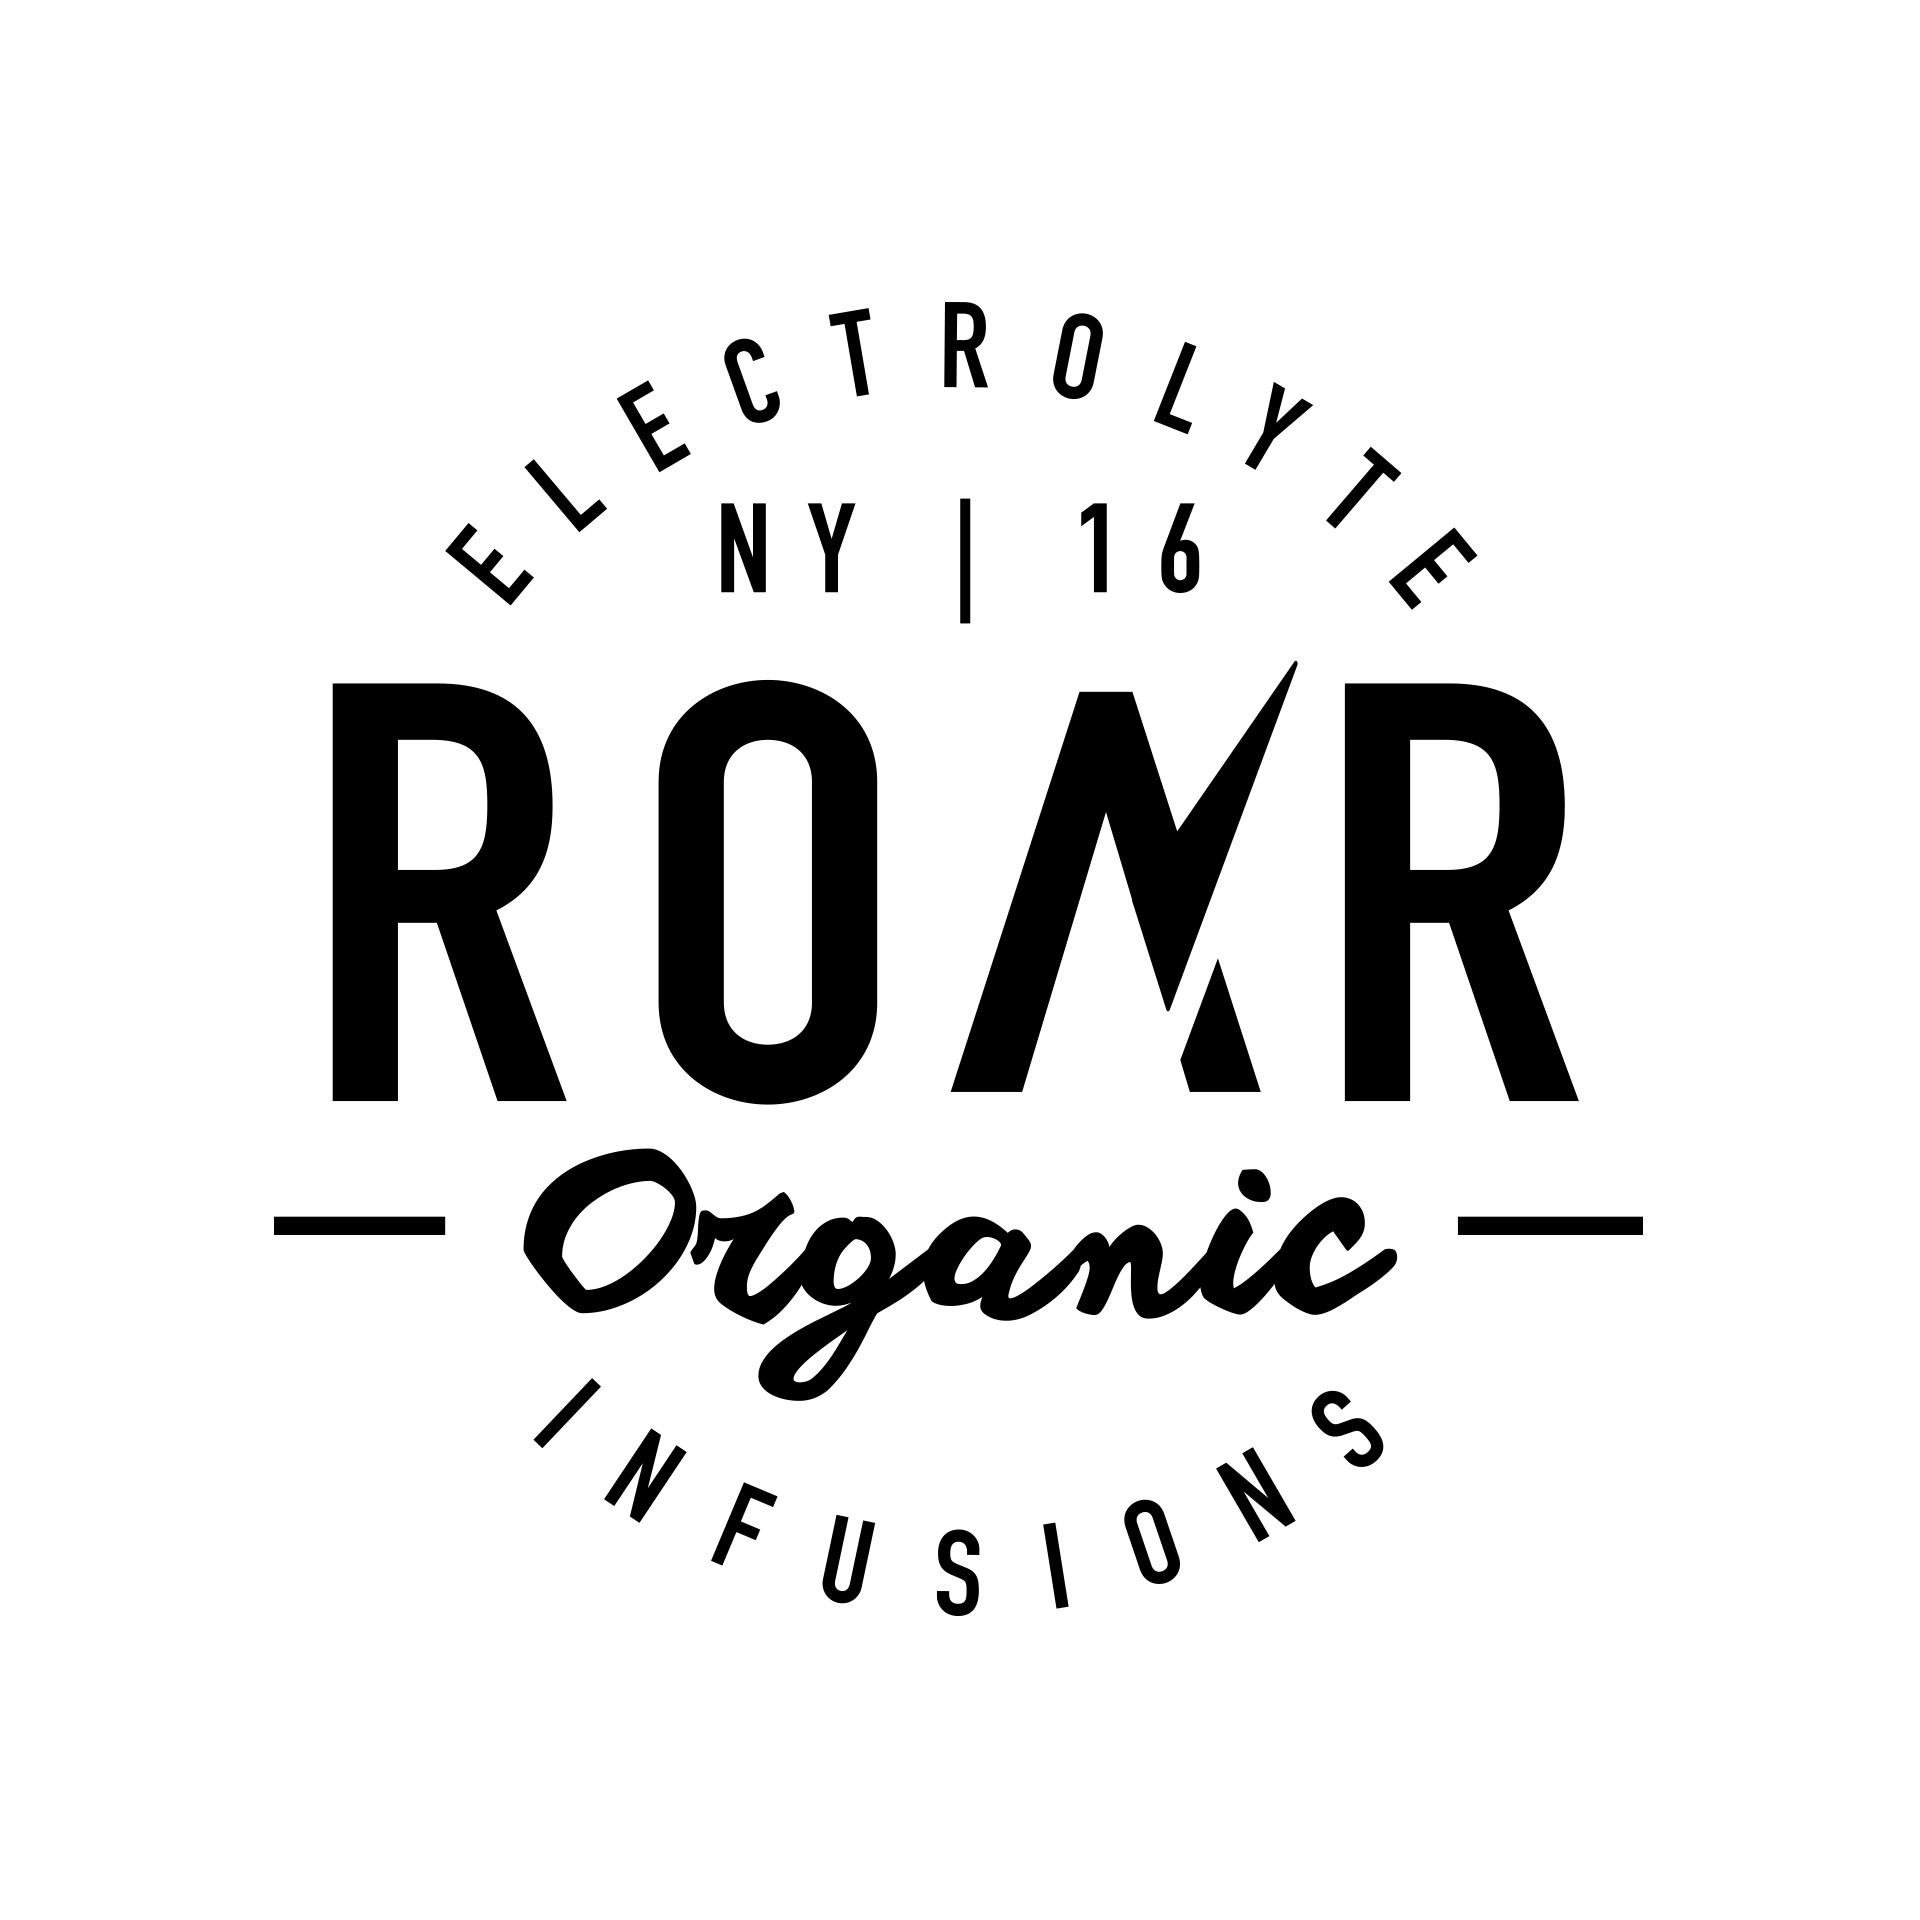 ROAR Organic Welcomes Bart Silvestro As COO & President